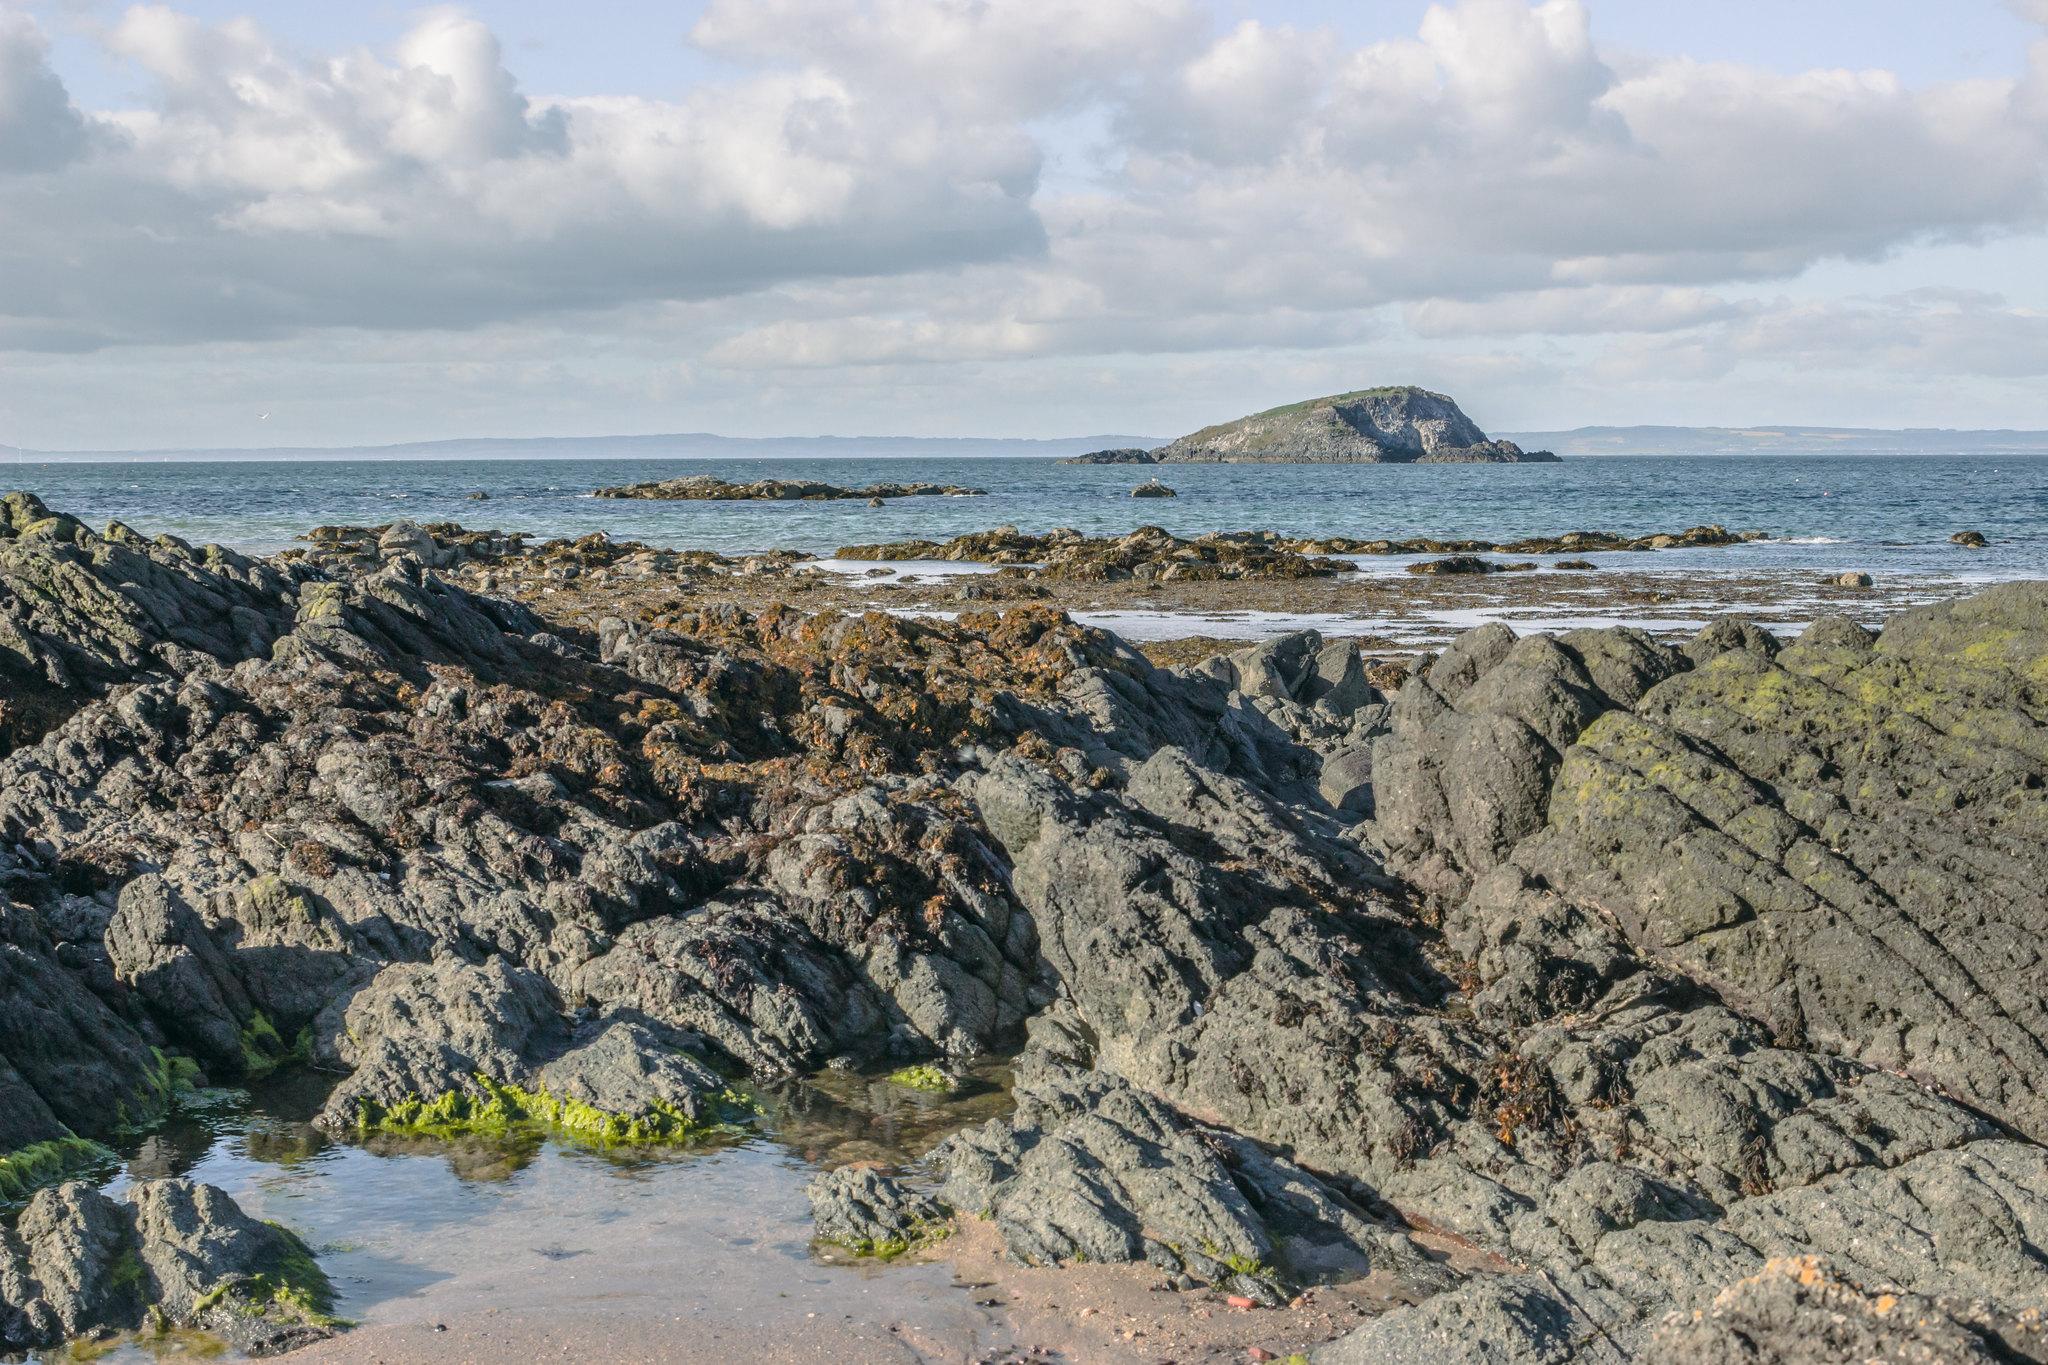 Tae Scotland 4 Gonnae Coastal - 11